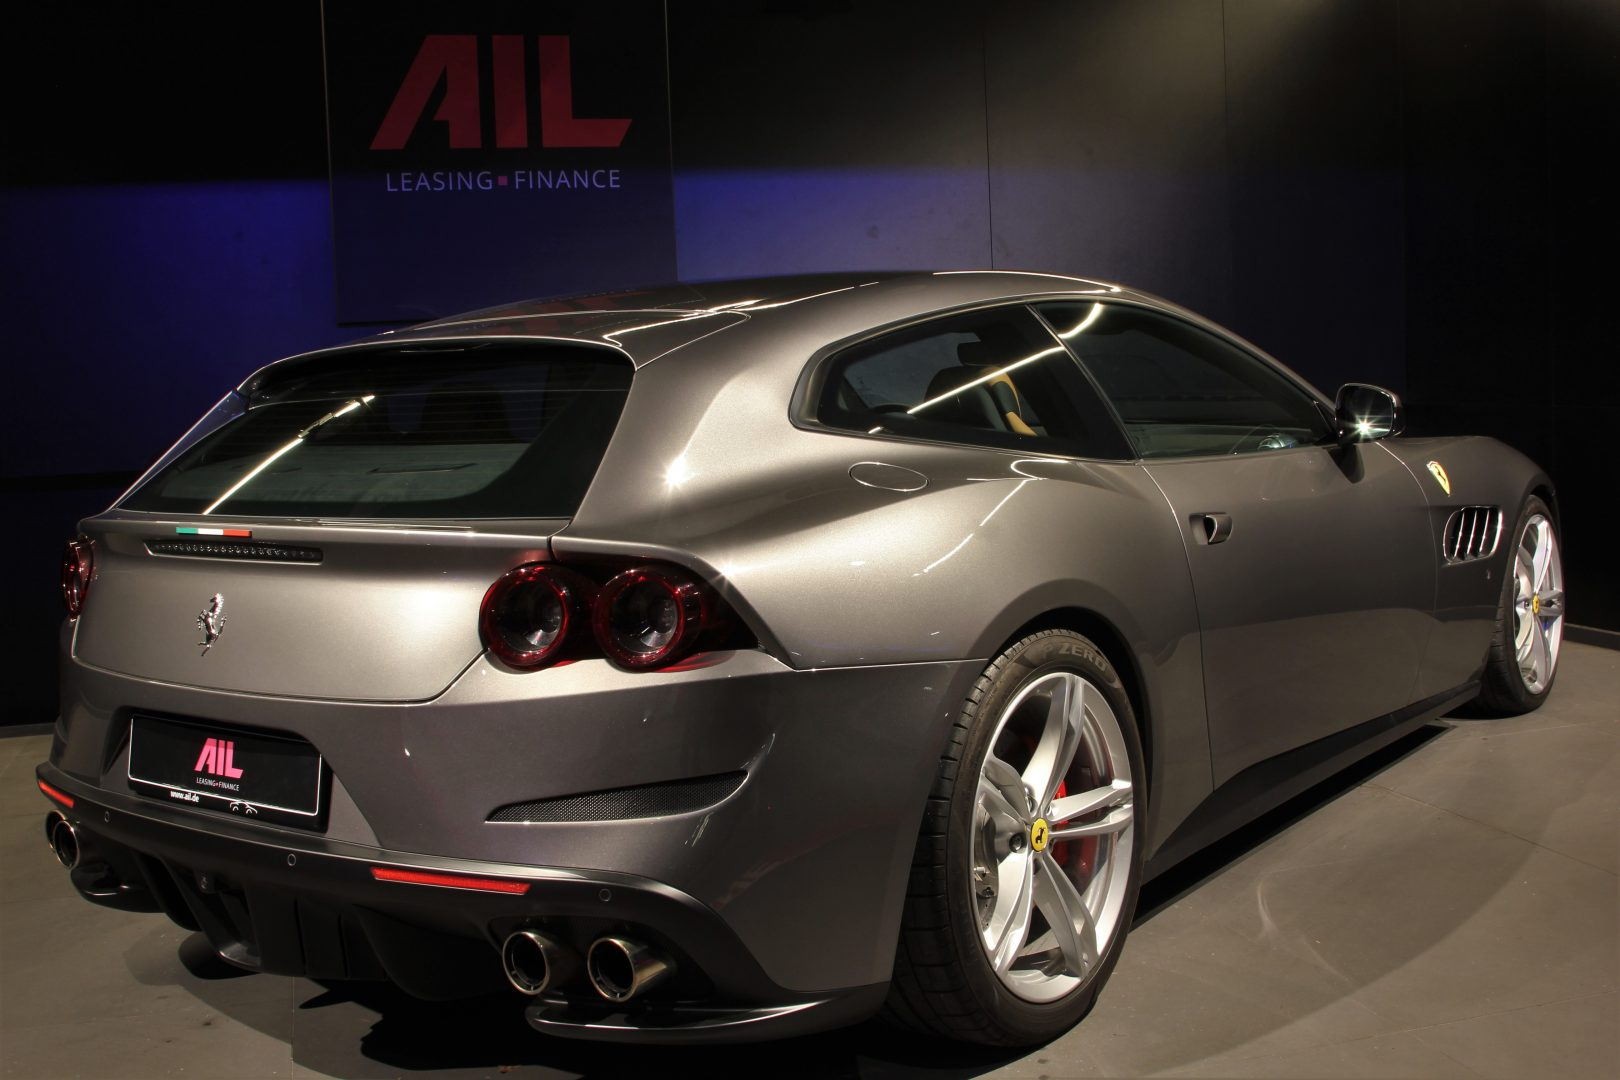 AIL Ferrari GTC4Lusso 4